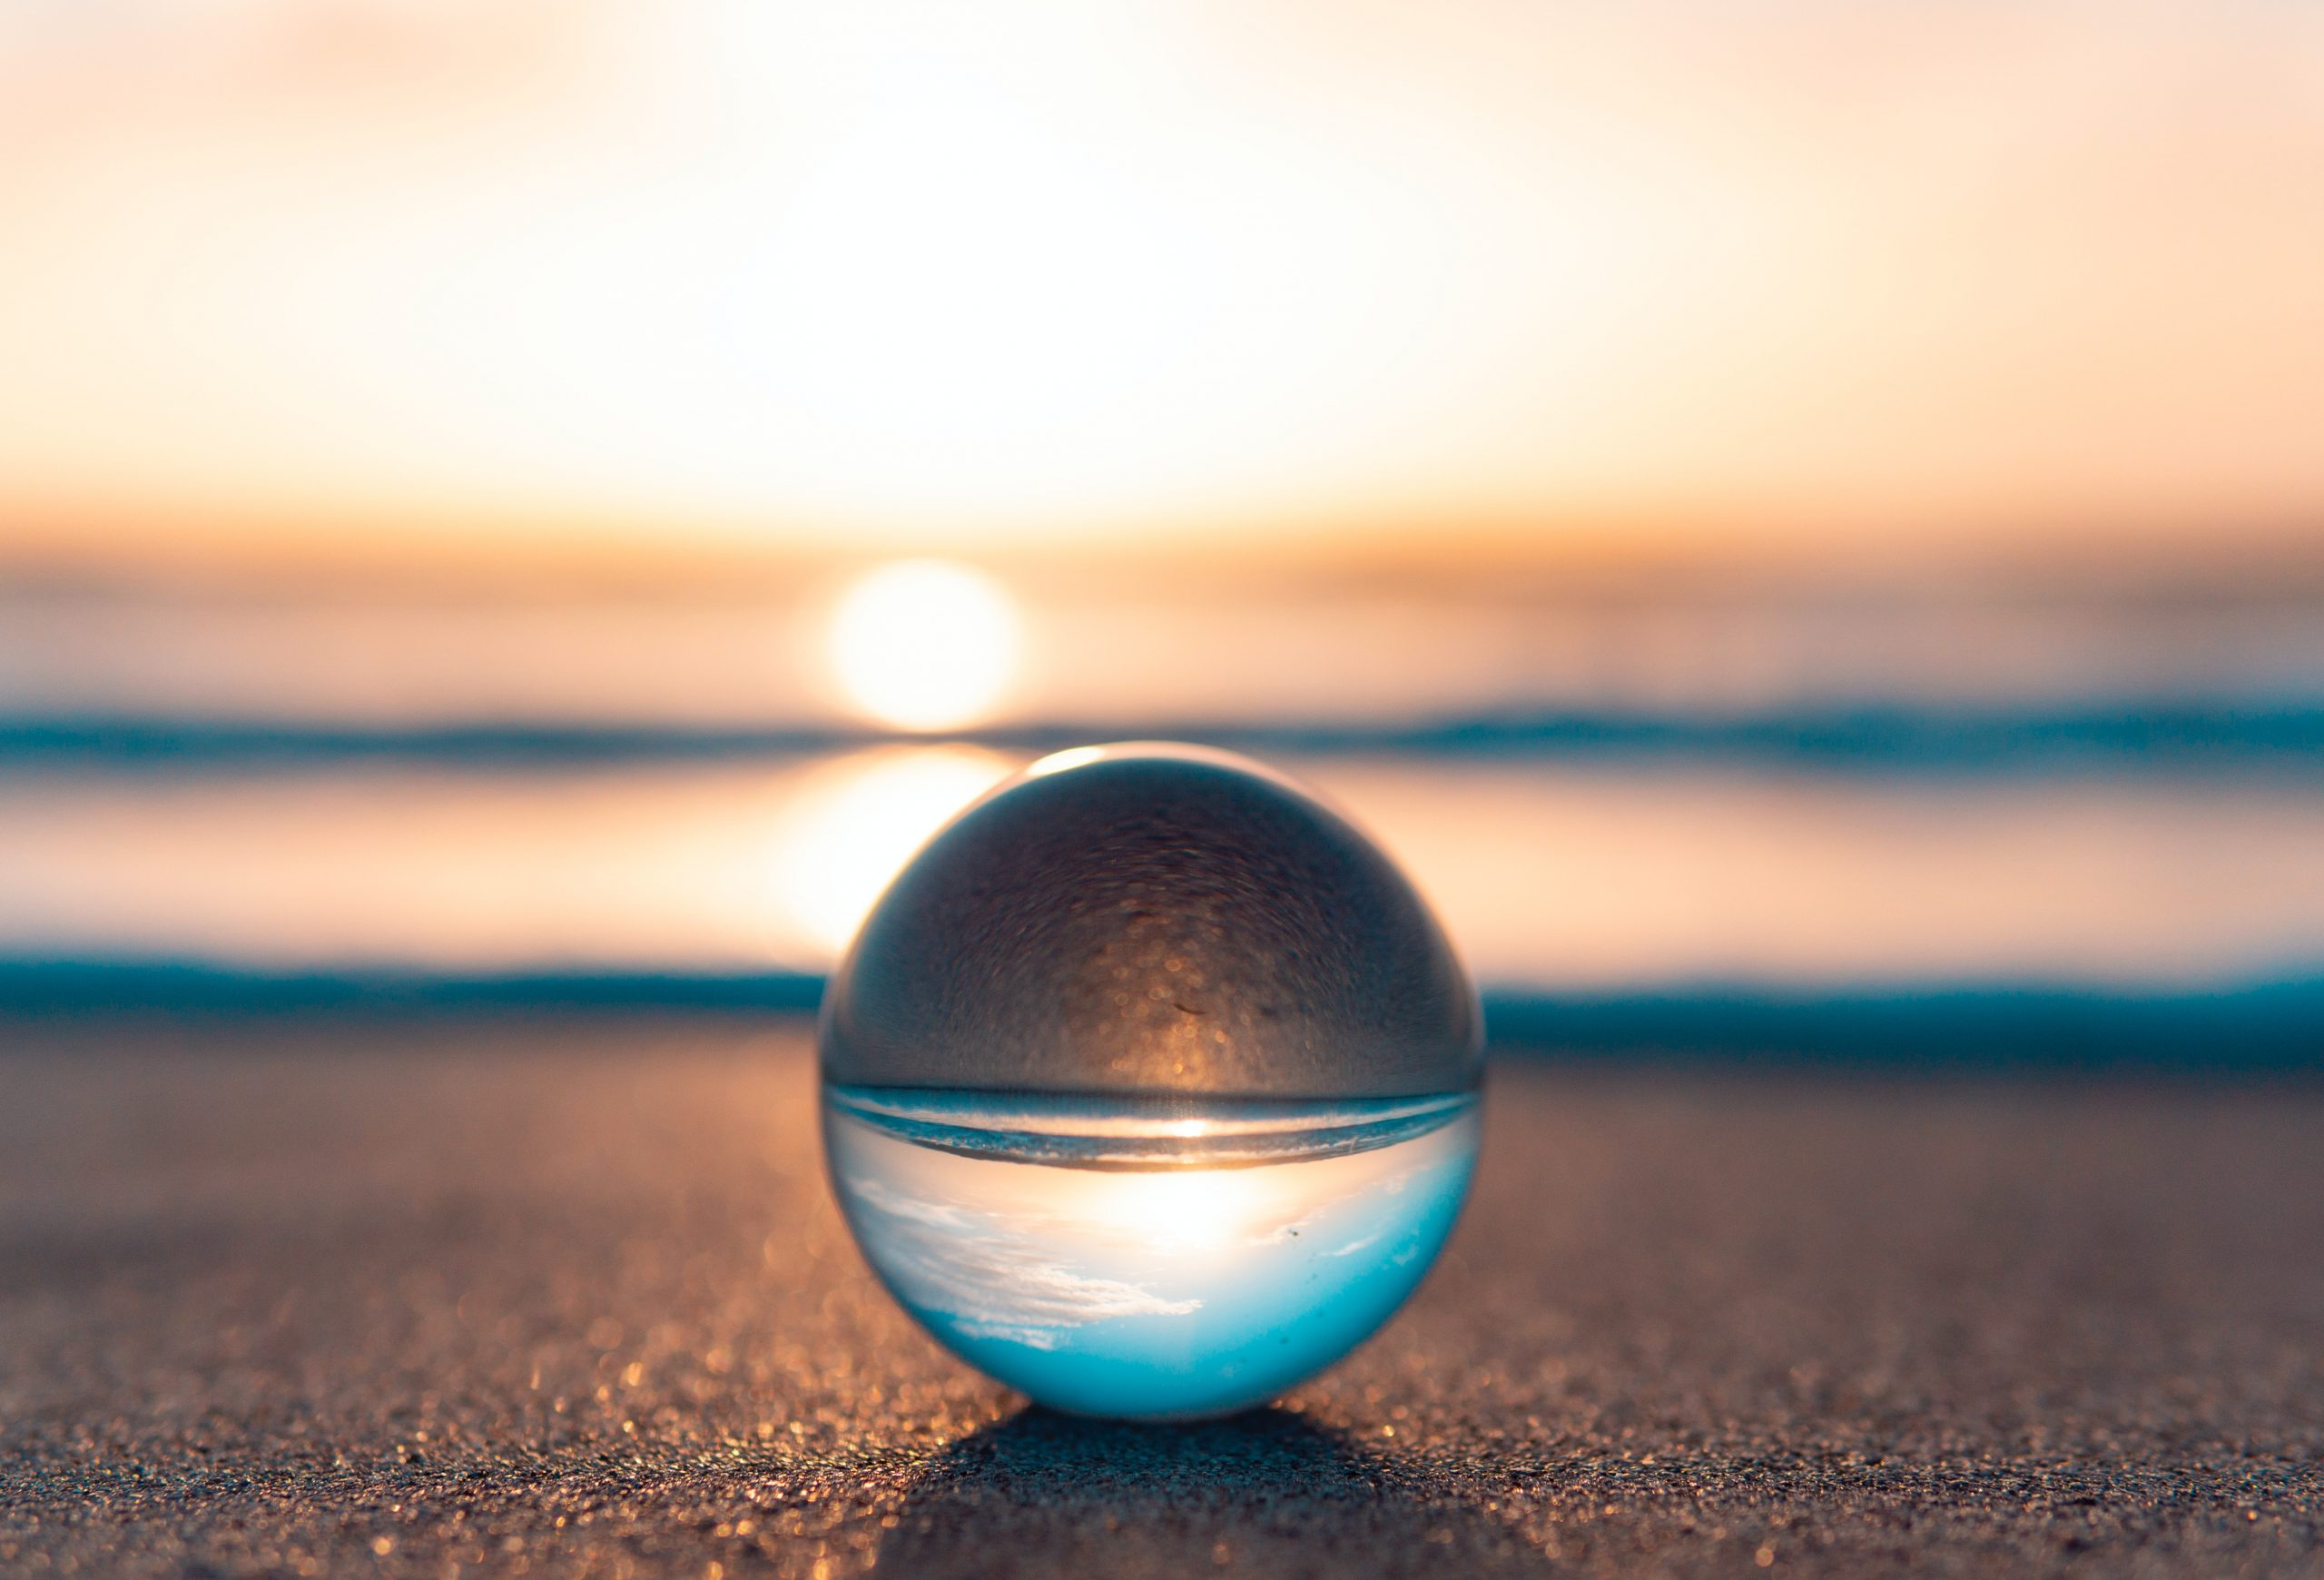 Sphère avec reflet